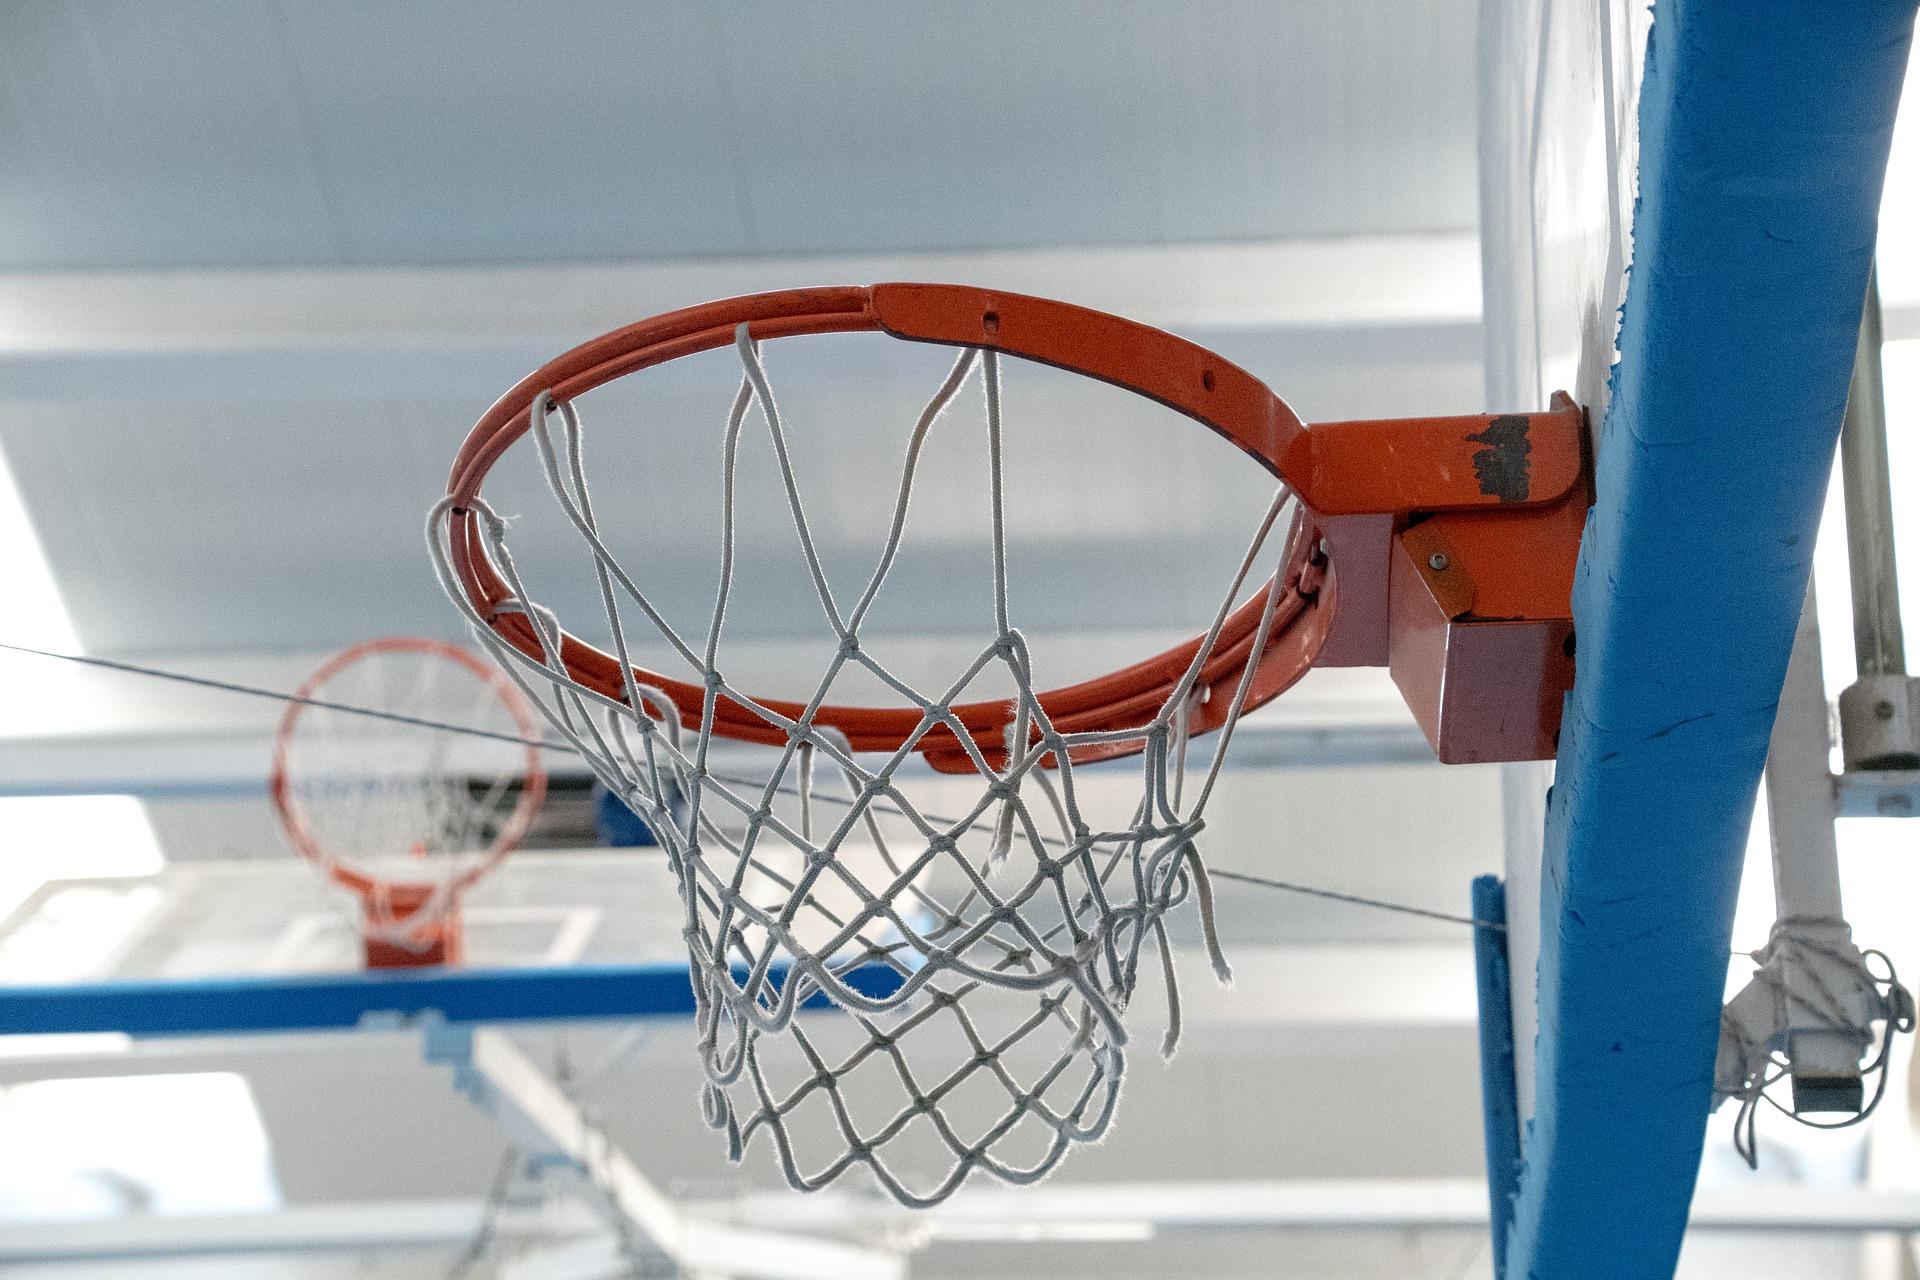 Torneig Nadal bàsquet